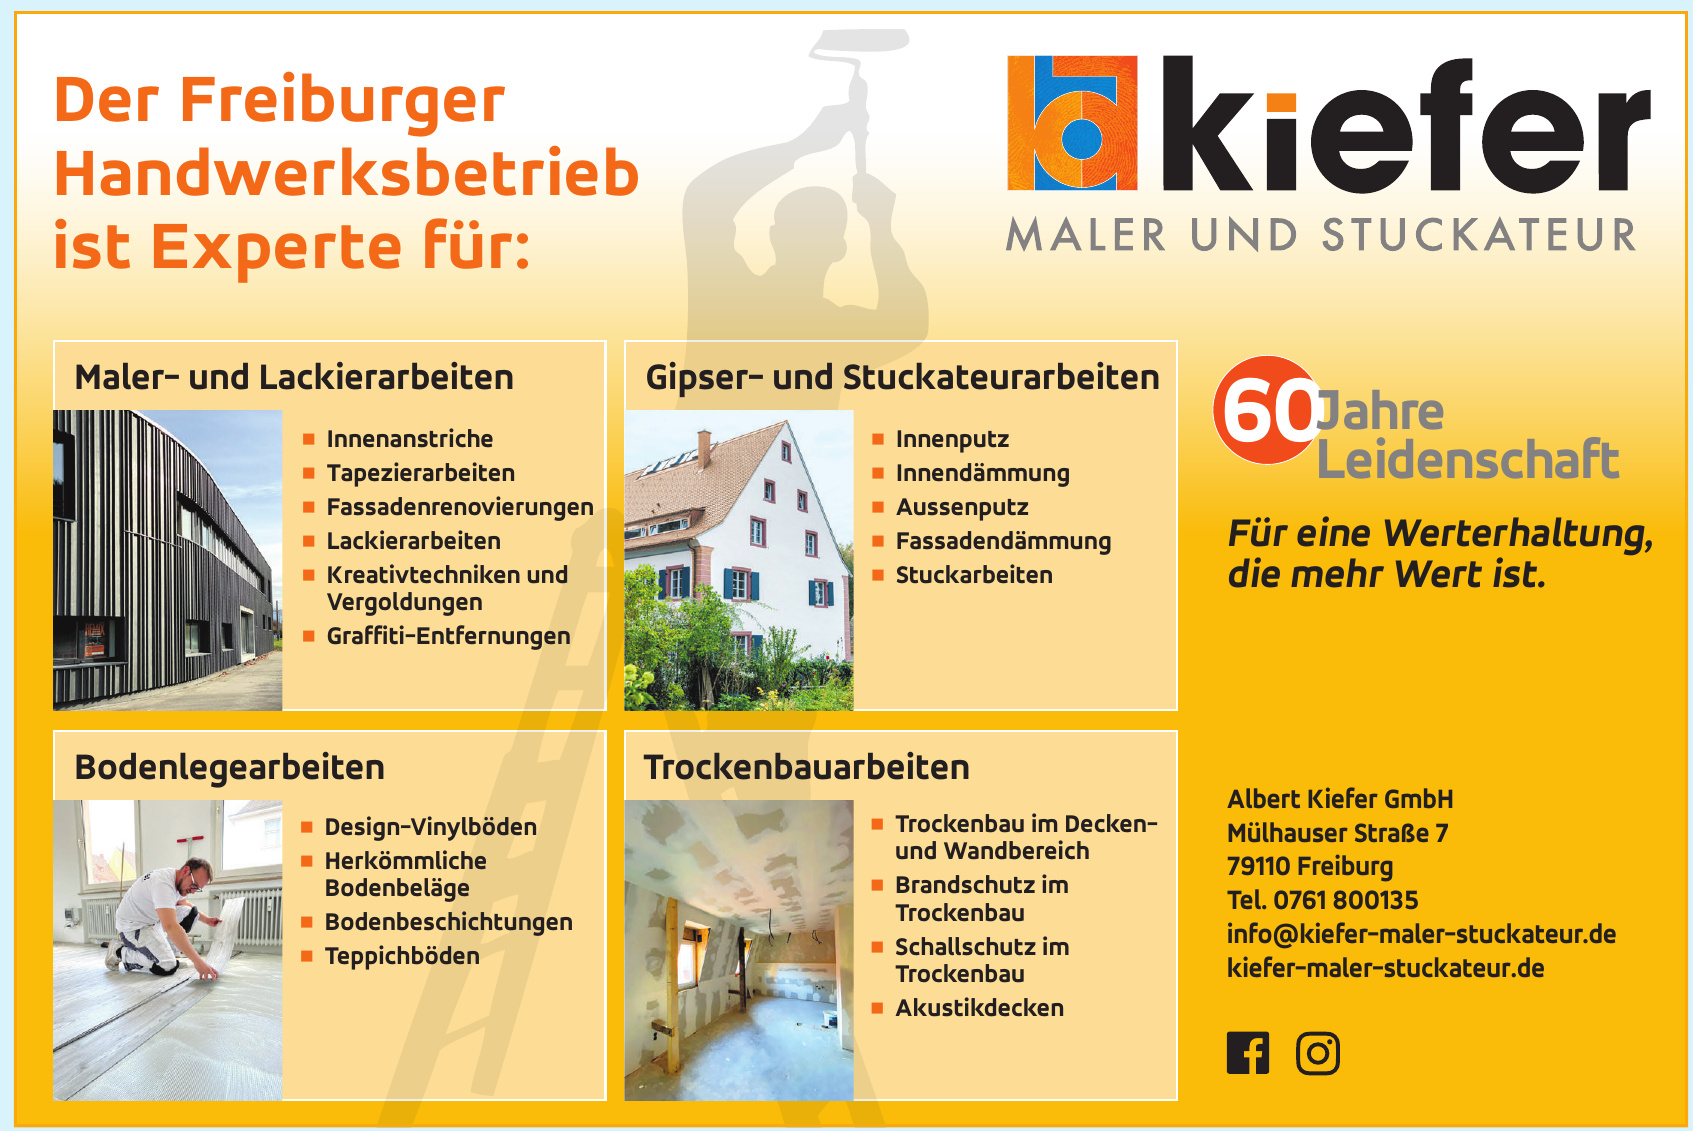 Albert Kiefer GmbH